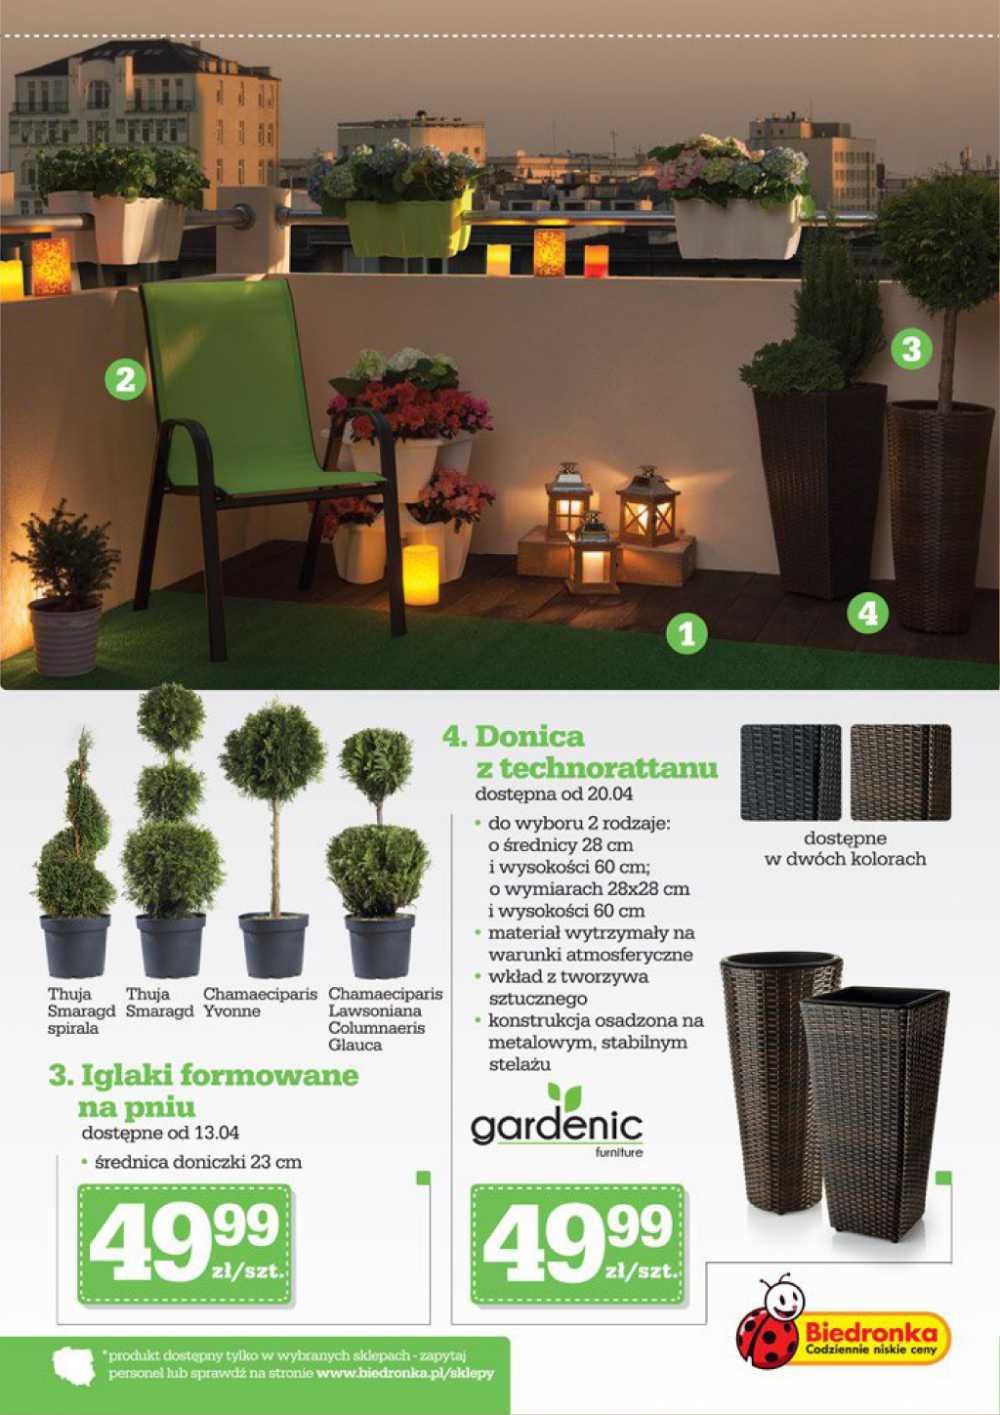 Meble Ogrodowe Gardenic Biedronka Q Housepl